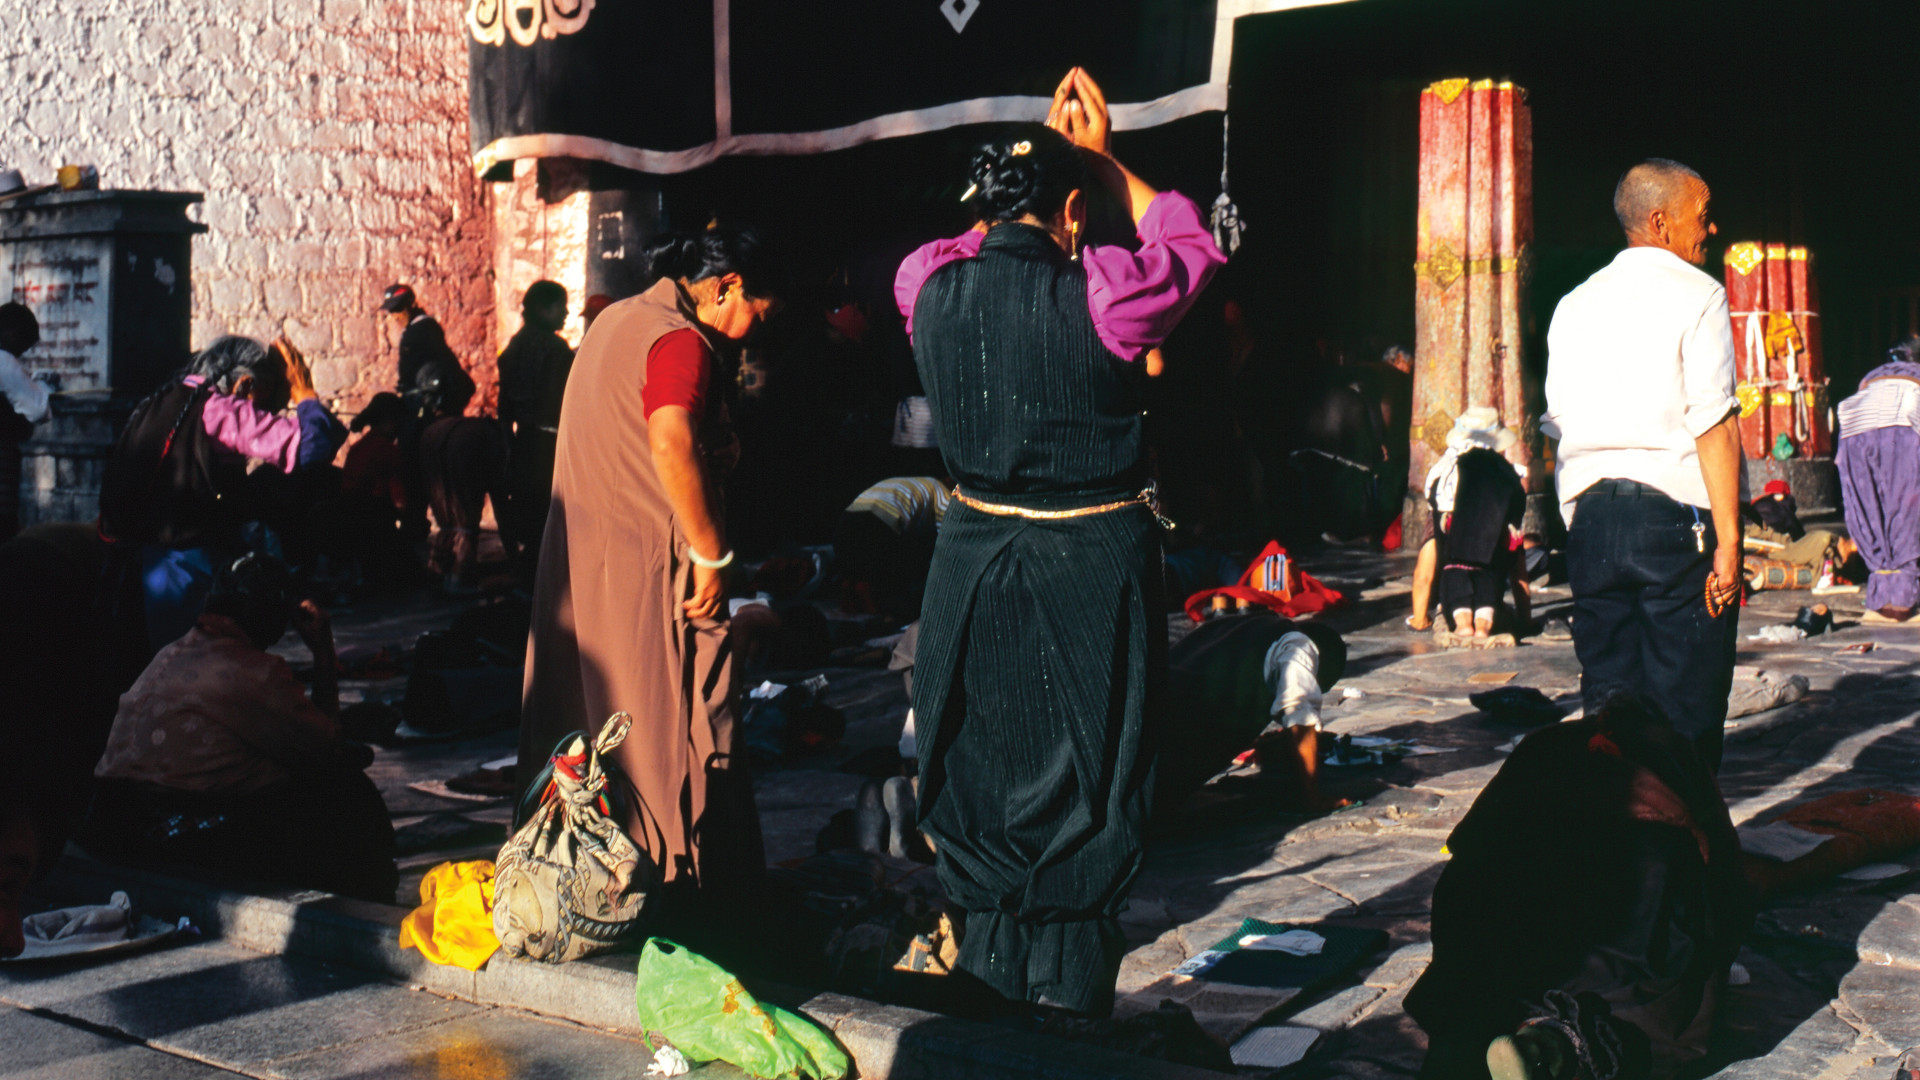 Two women praying amongst other worshipers